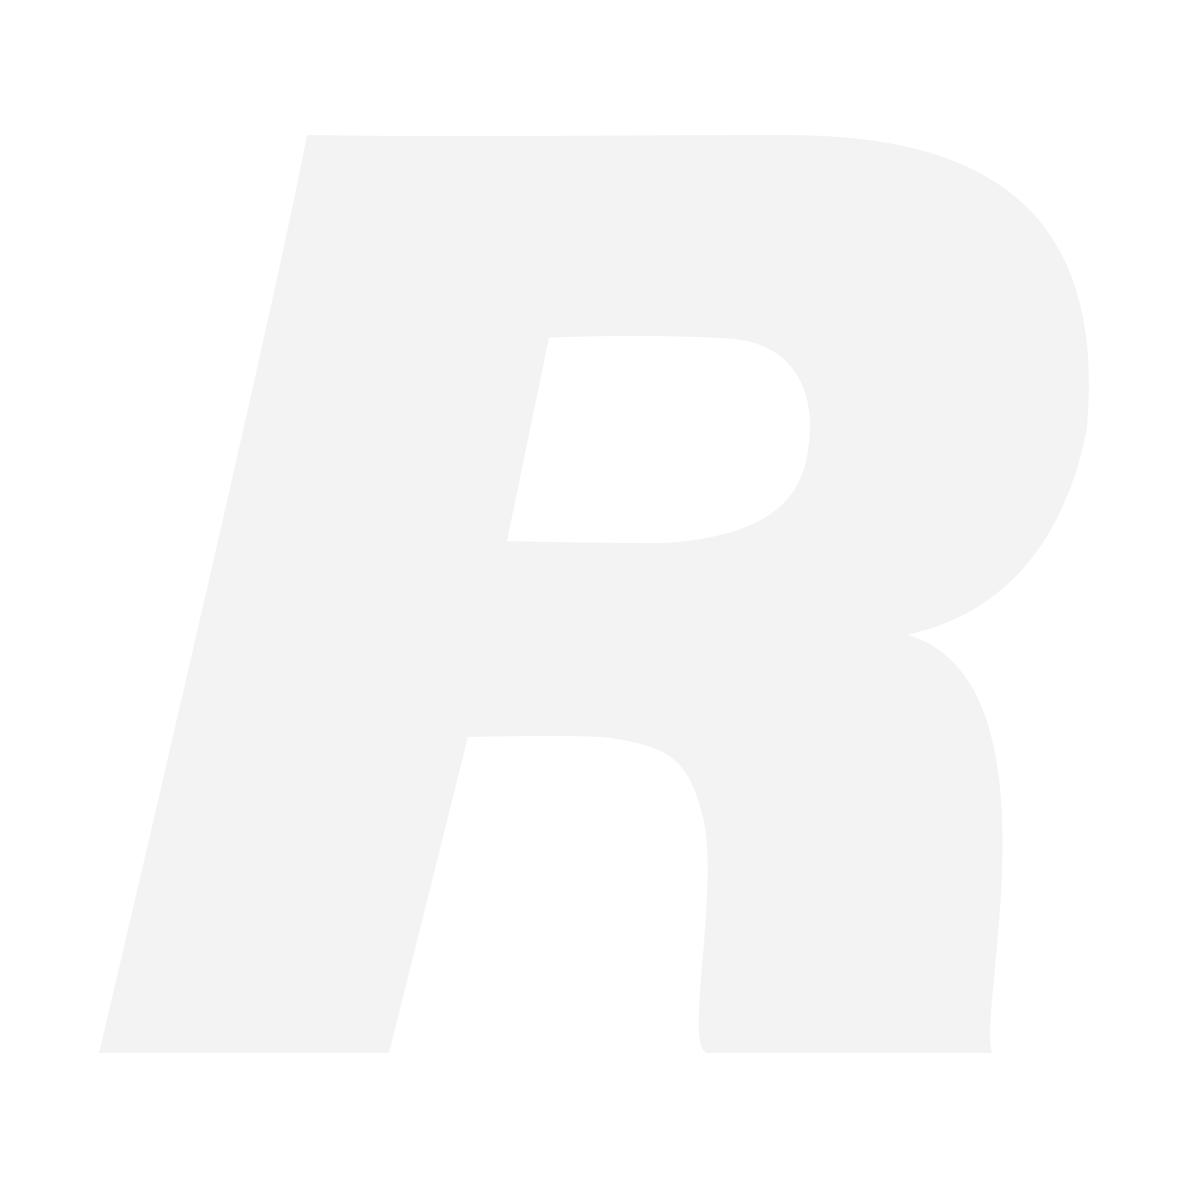 Sony A7R Mark III kamerahus